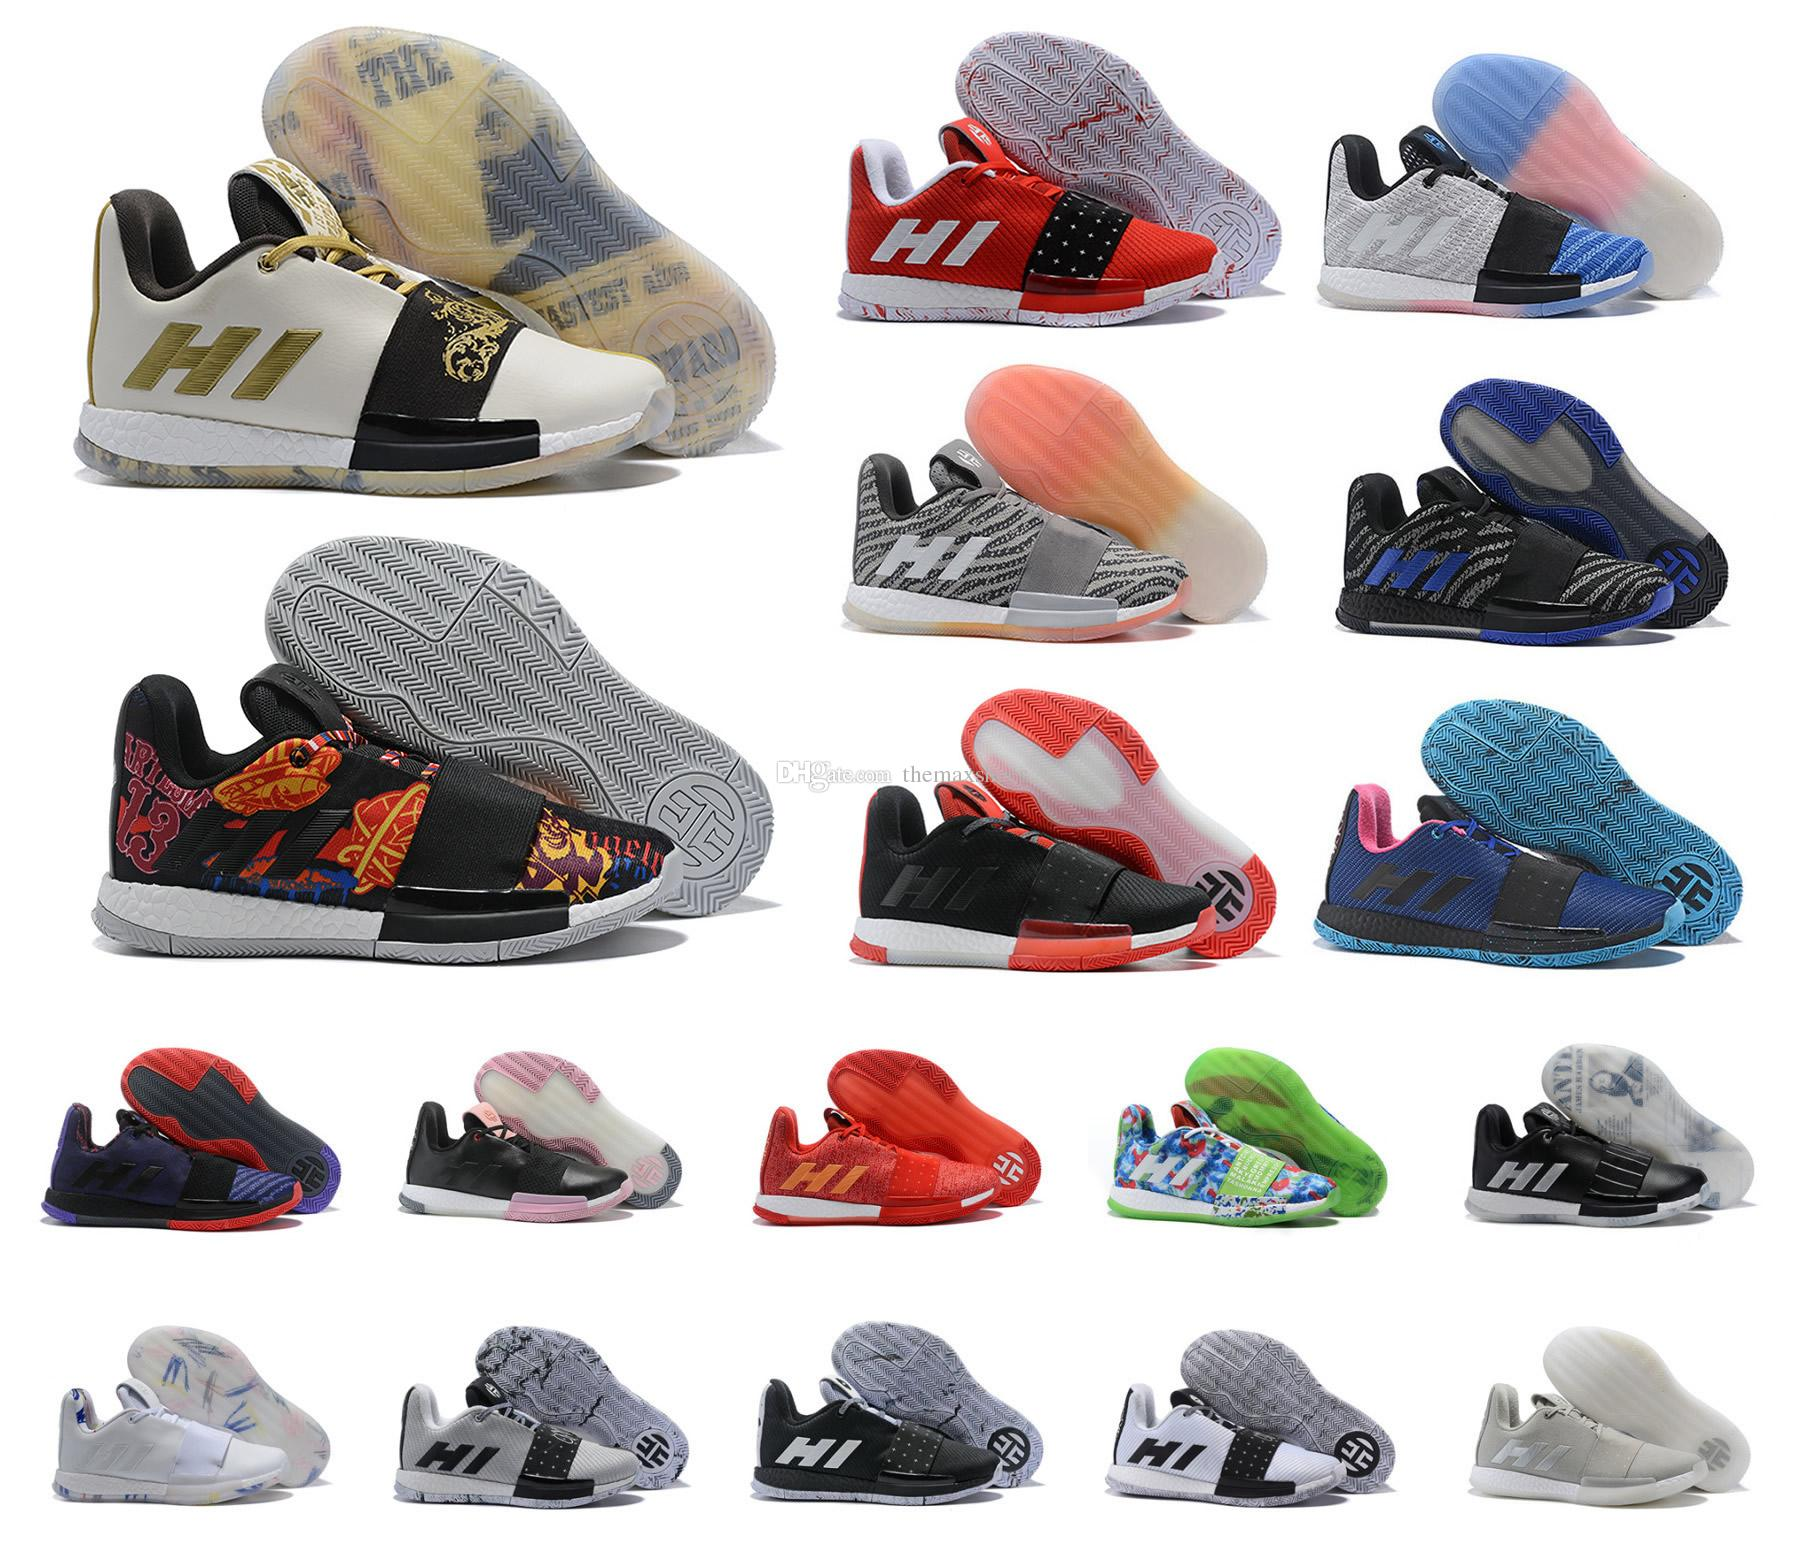 2d18e949f594 Hot Mens James Harden Vol. 3 III MVP Basketball Shoes Multicolor Weaving Sneakers  Men 3s Trainers Sports Shoes Size US 7 11.5 Womens Basketball Shoes ...